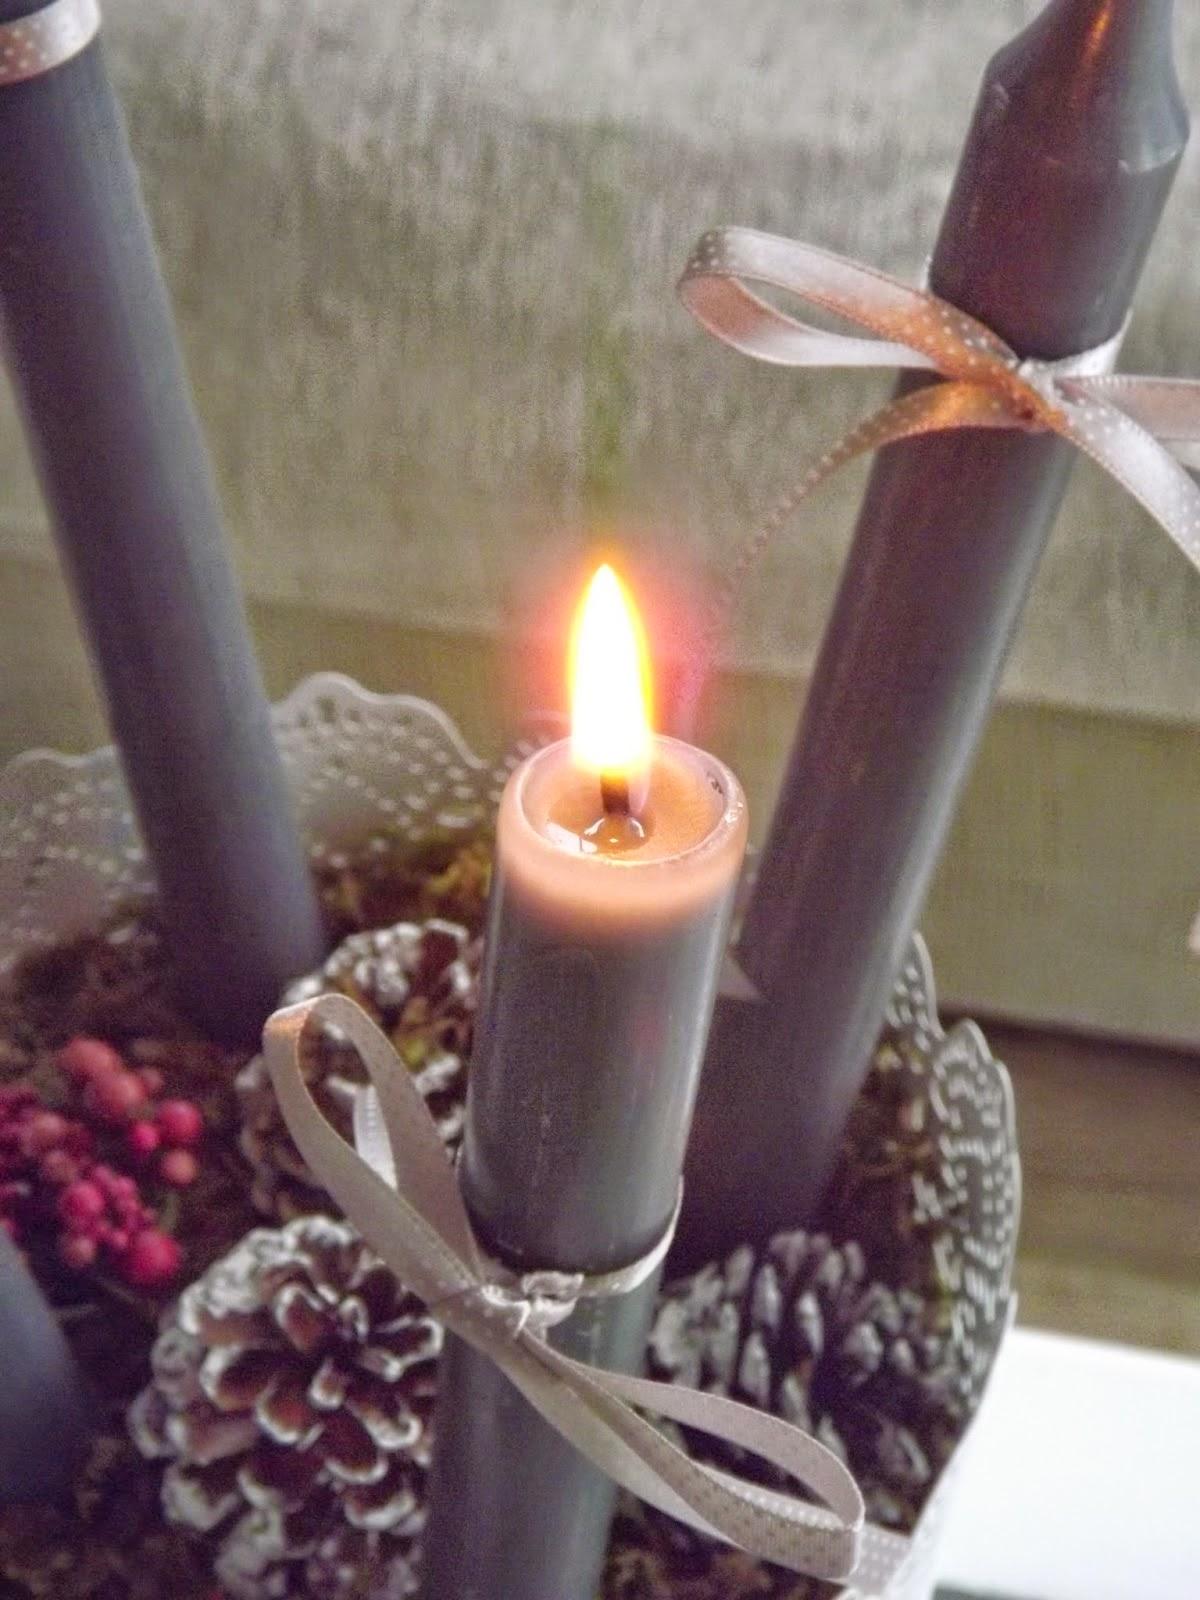 Primera vela encendida...